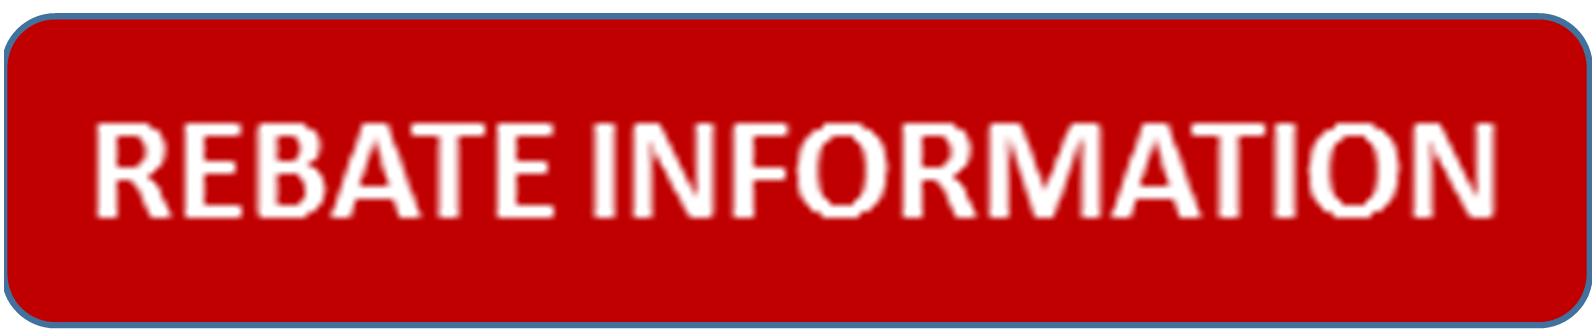 Rebate Information